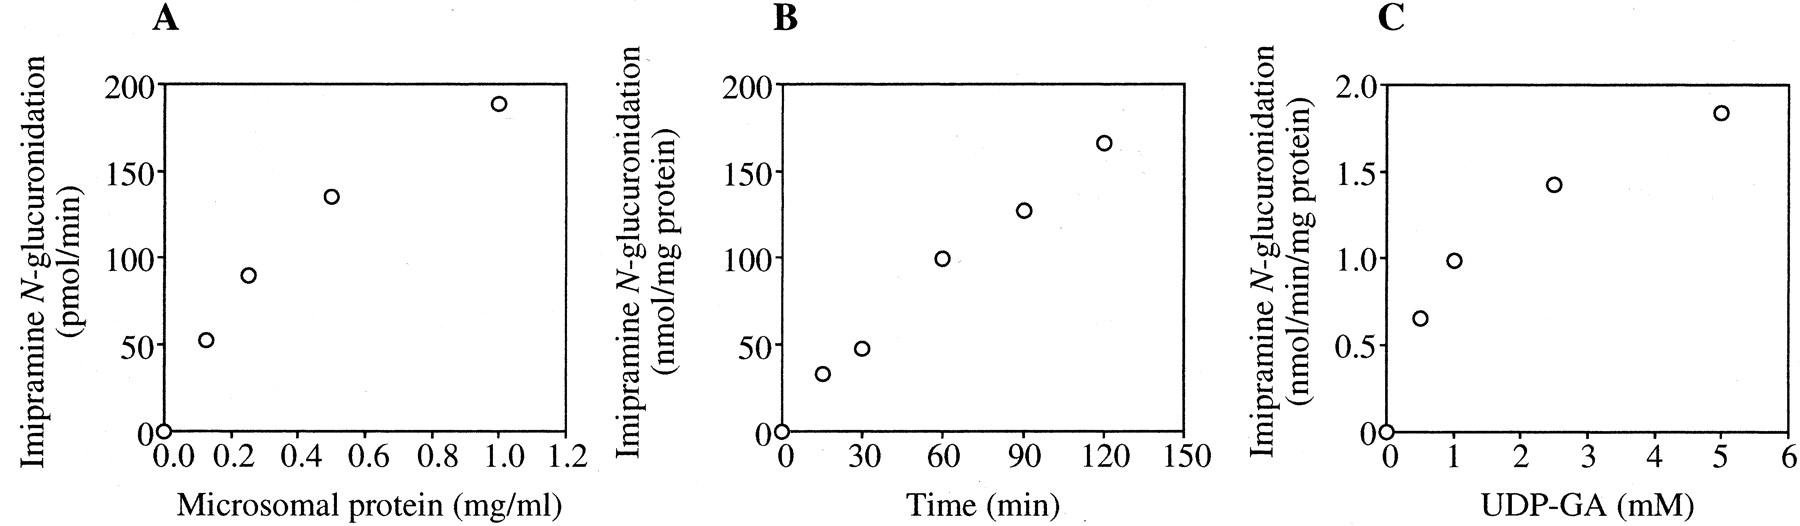 Imipramine N Glucuronidation In Human Liver Microsomes Biphasic